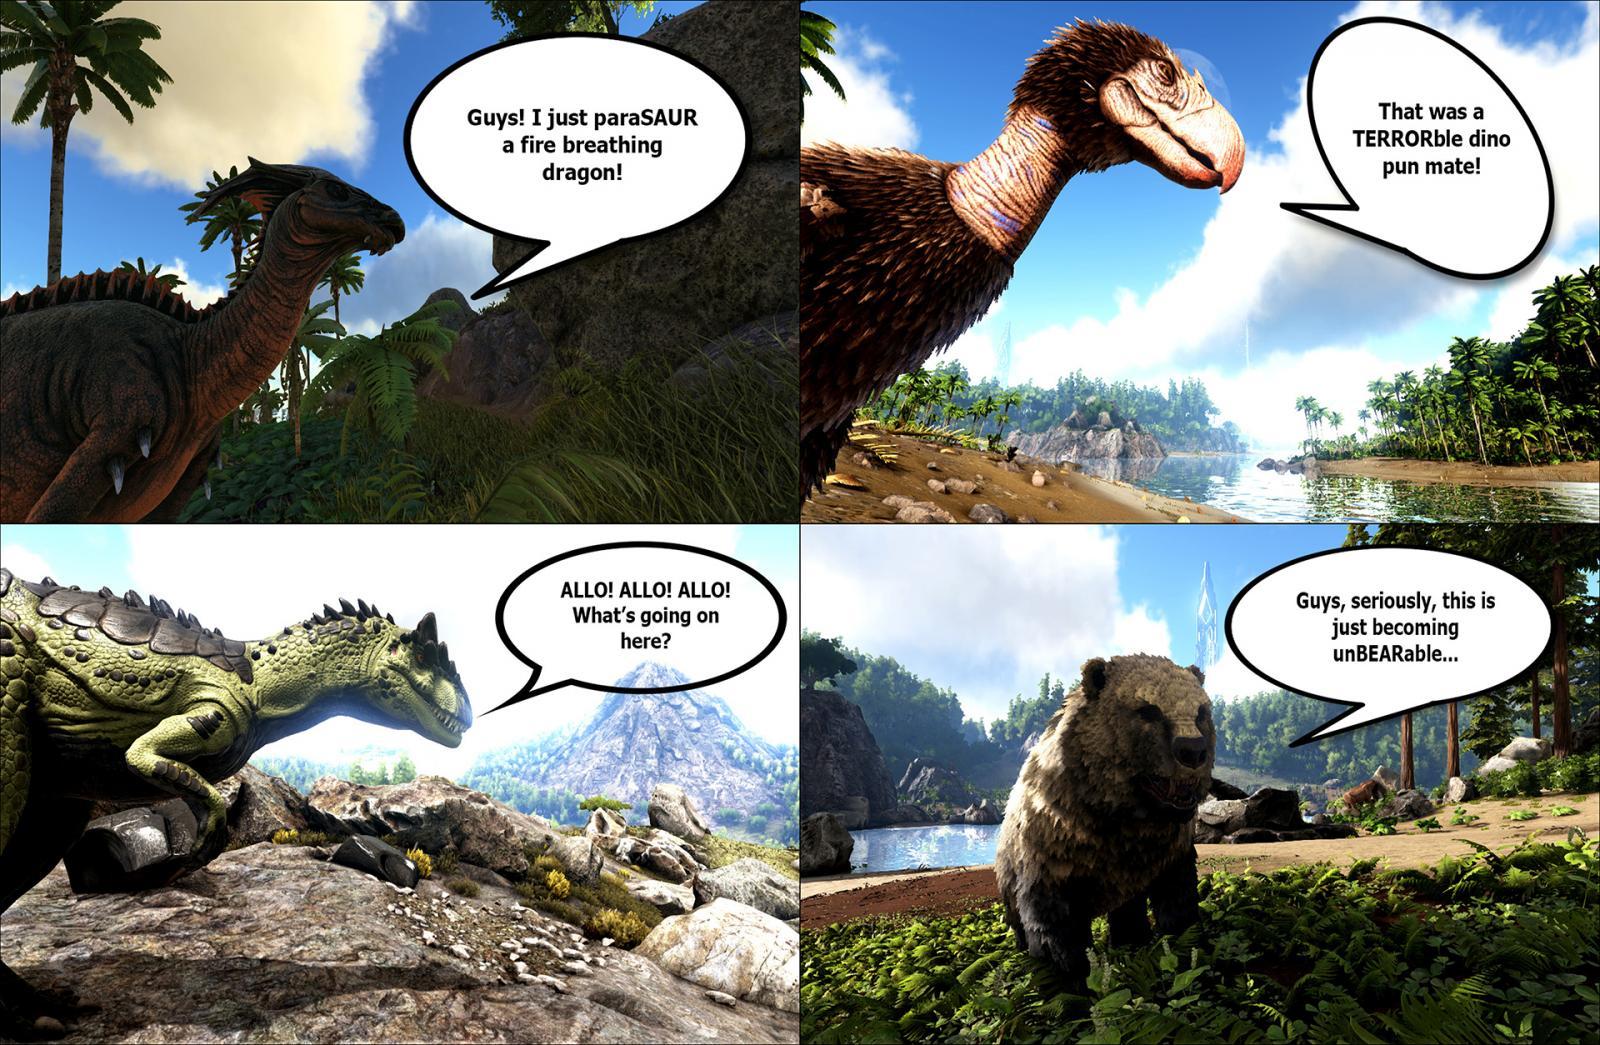 large.5944a9ee55874_JoeLally-DinoPuns-8x.jpg